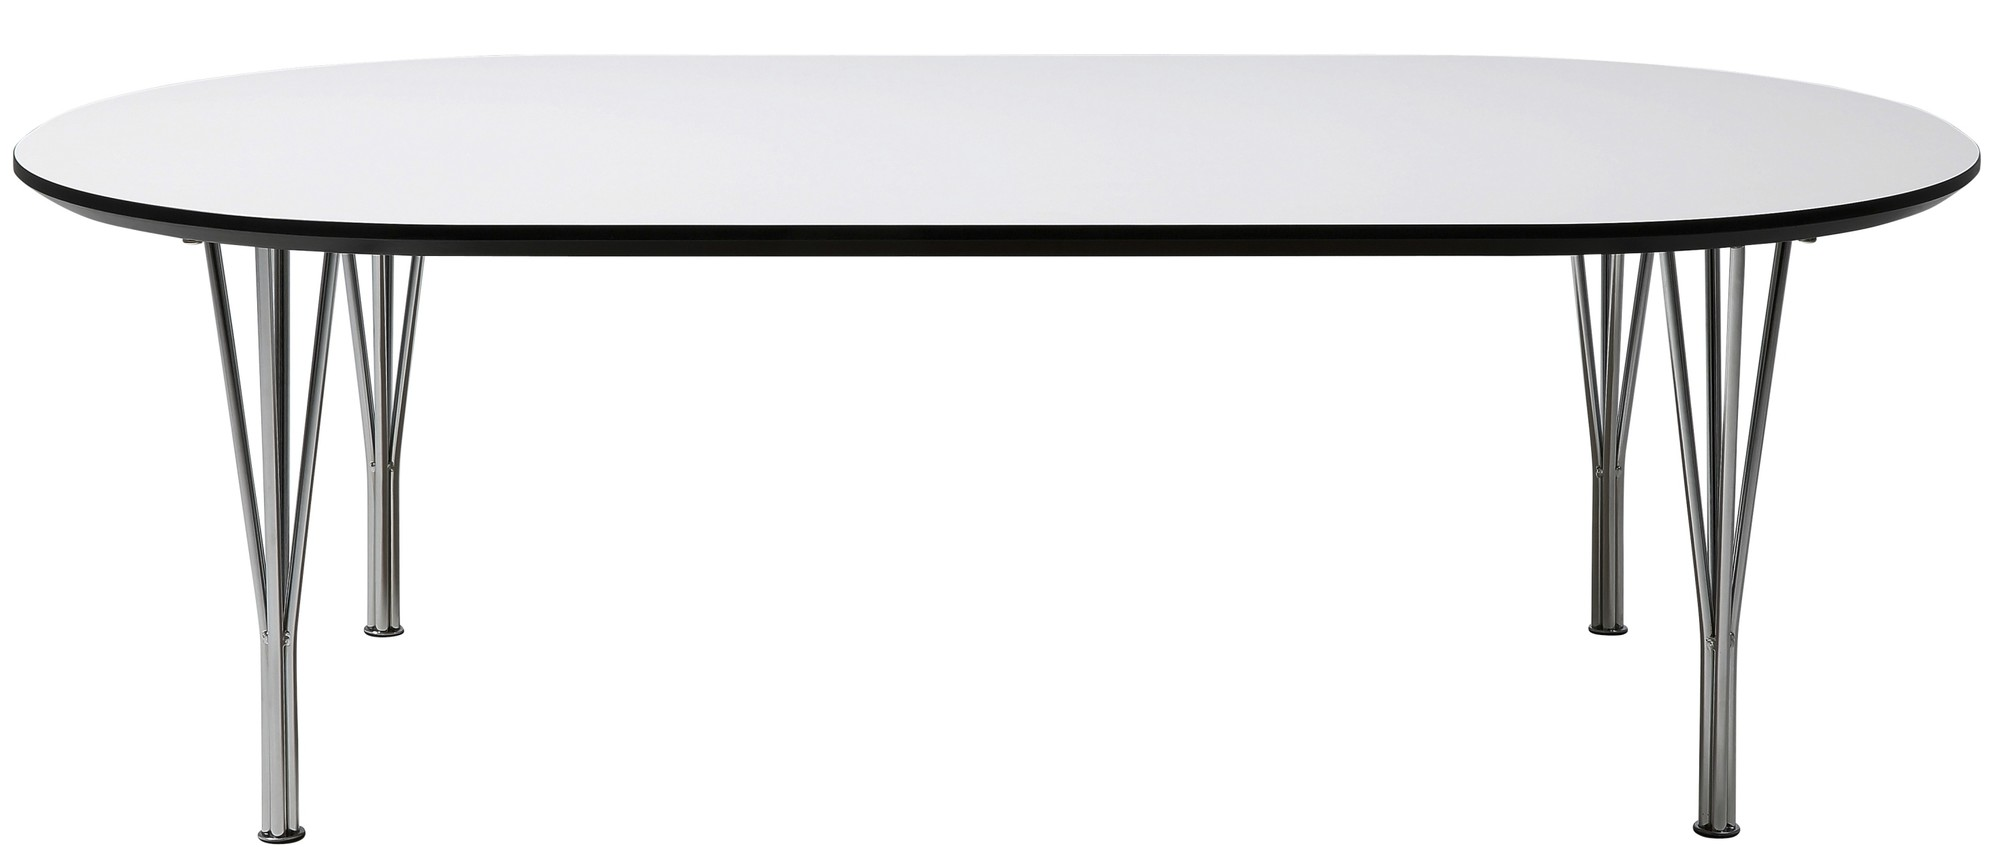 ... Tafel Weston L180 x B100 x H75 cm Wit HPL Tafelblad Chromen Poten